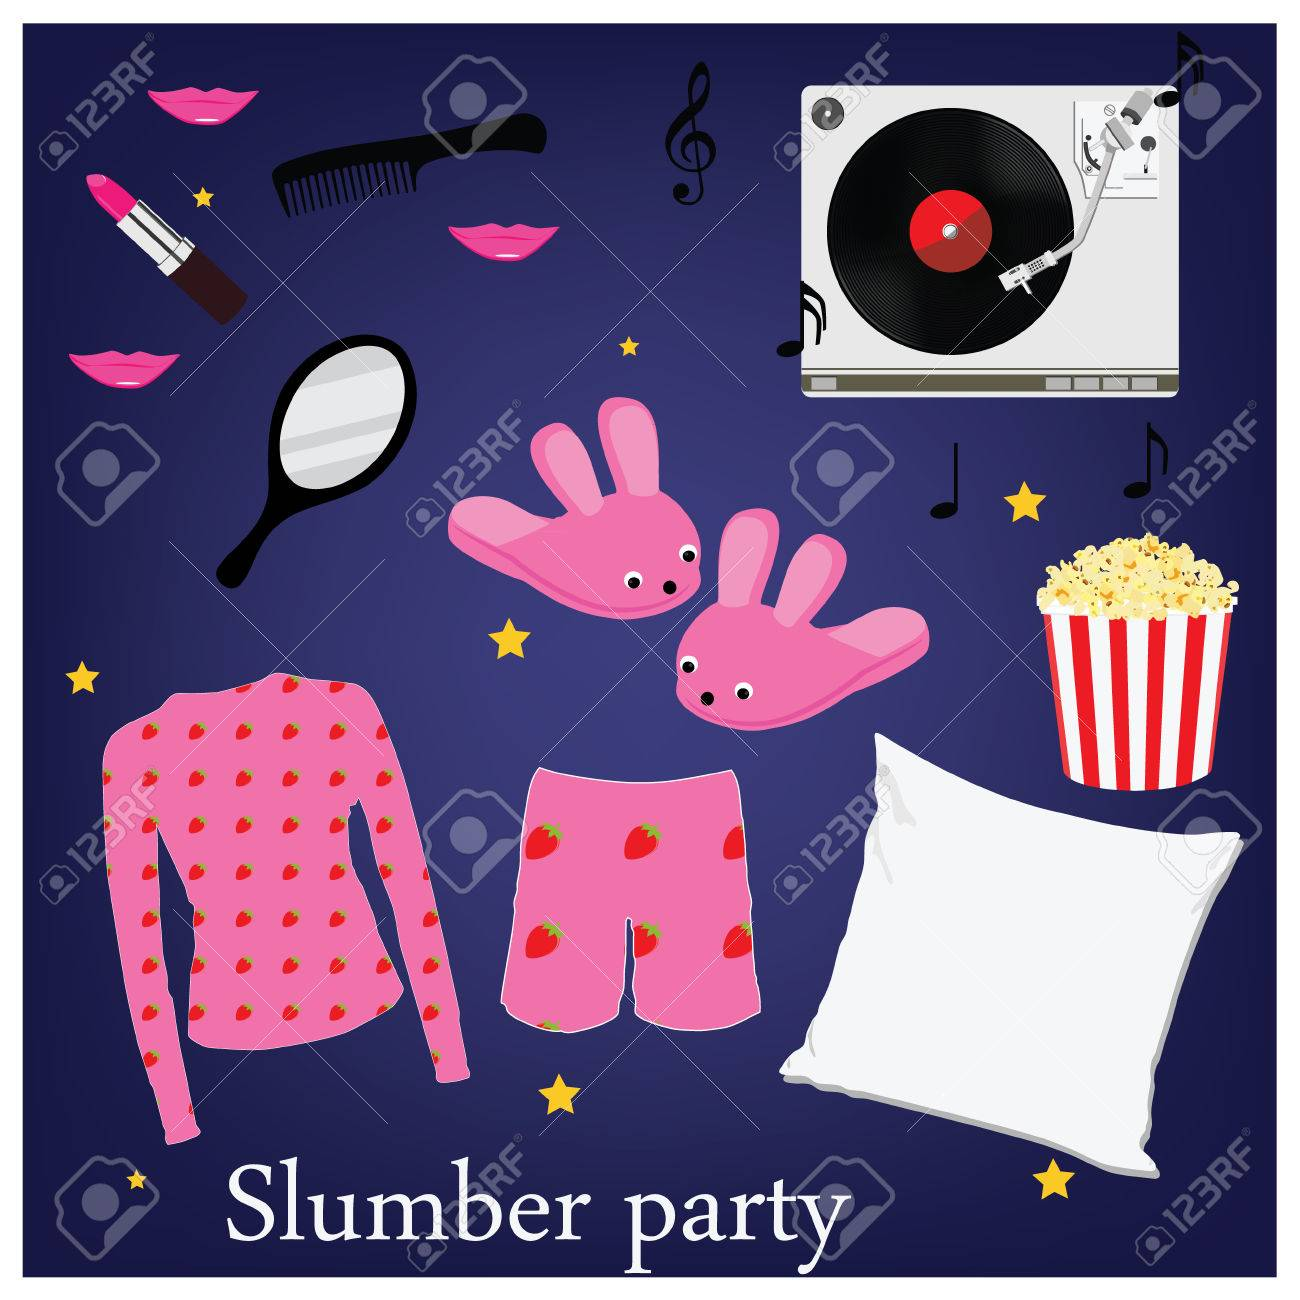 Slumber Party Invitation Symbols, Elements. Sleepover. Pajama ...